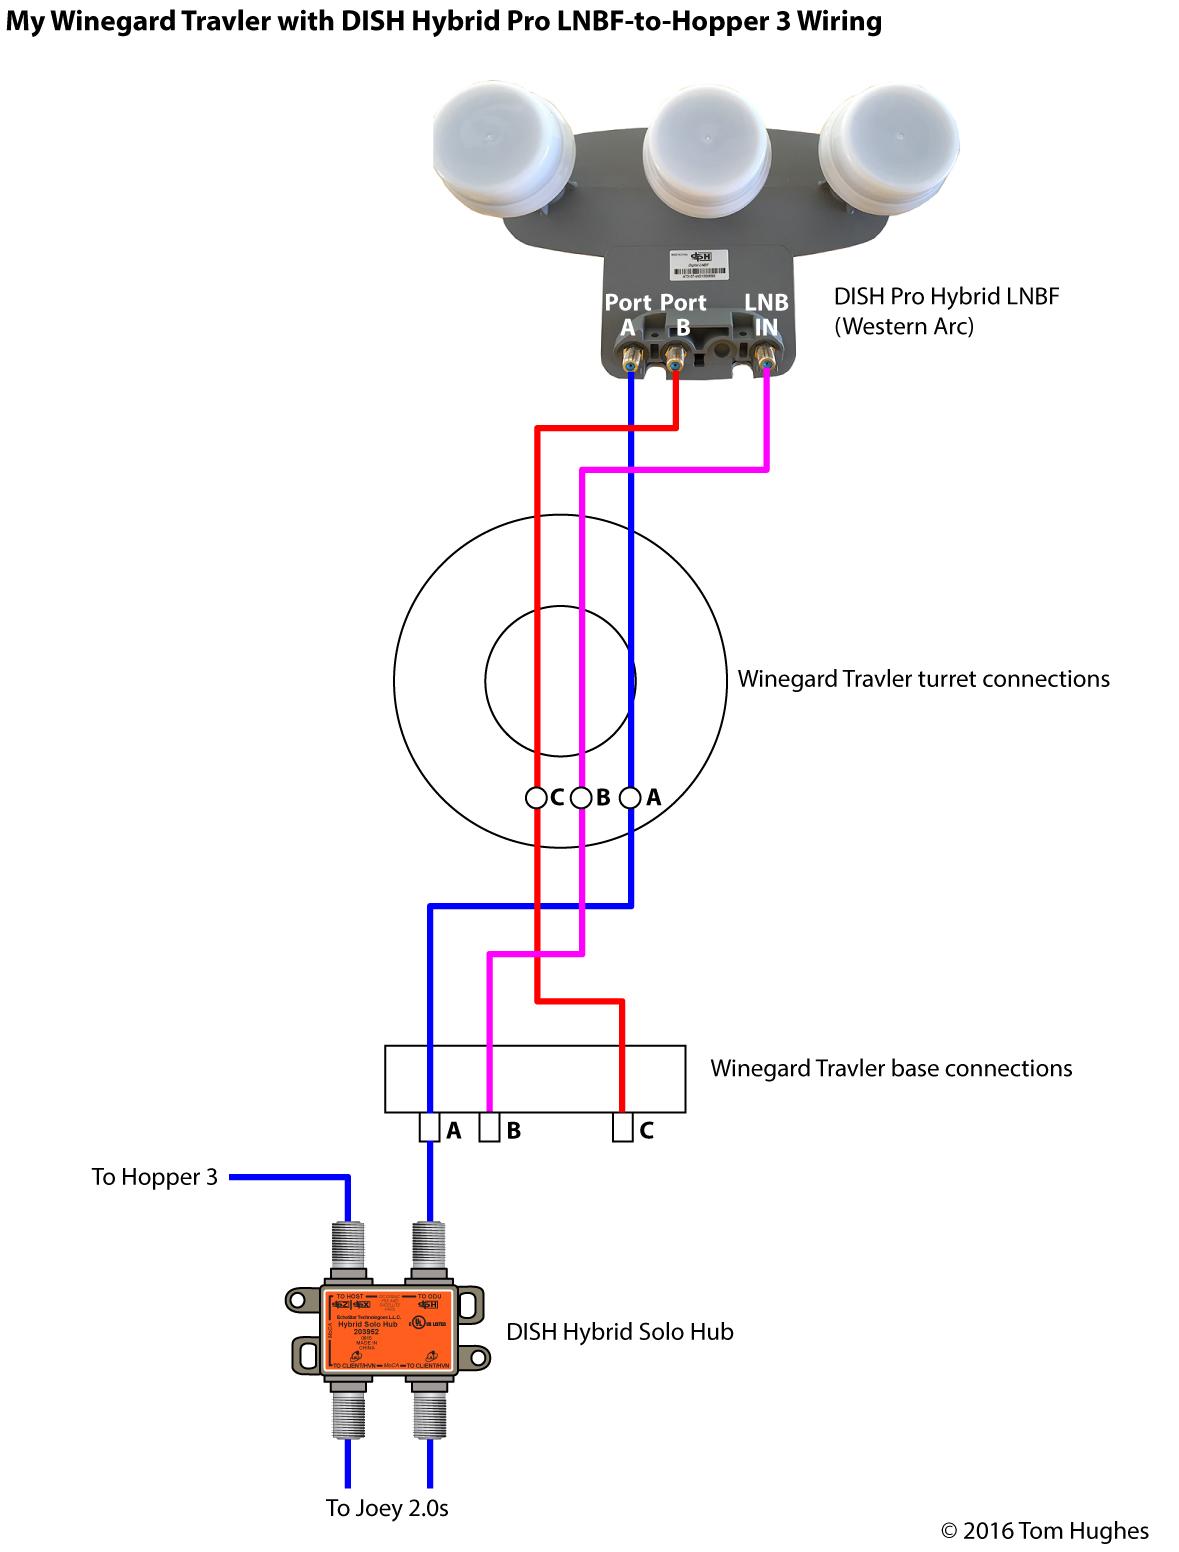 winegardtravlerhybrid to hopper3?w=620 dish pro hybrid winegard travler upgrade (no longer recommended hopper 3 wiring diagrams at gsmx.co